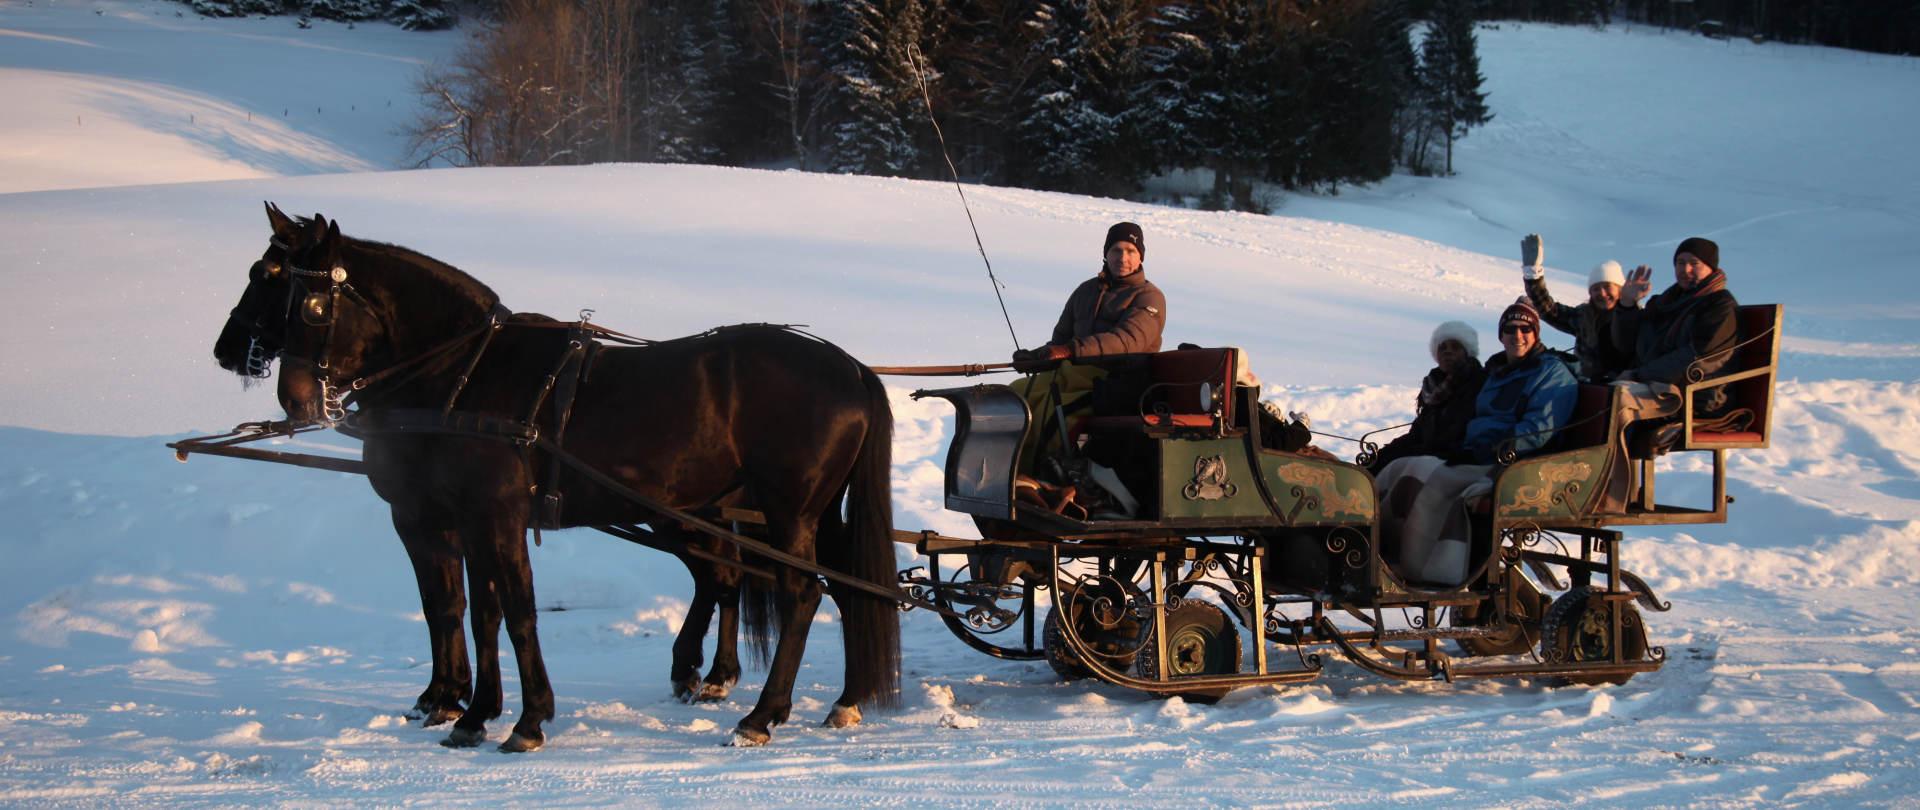 horse drawn sleigh ride tour to styria incl sleigh ride